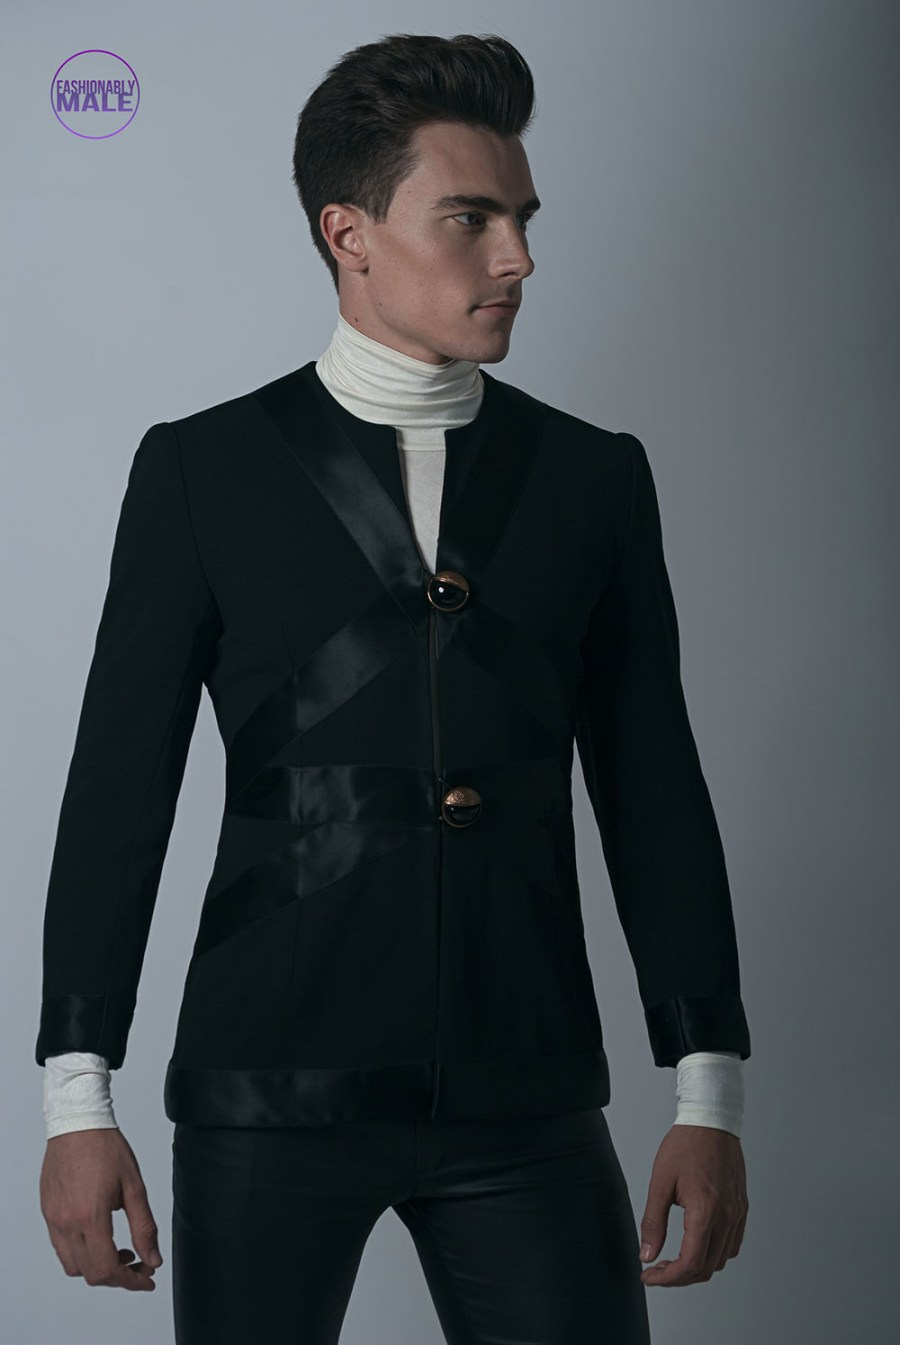 Tomas by Jo Herrera for Fashionably Male5